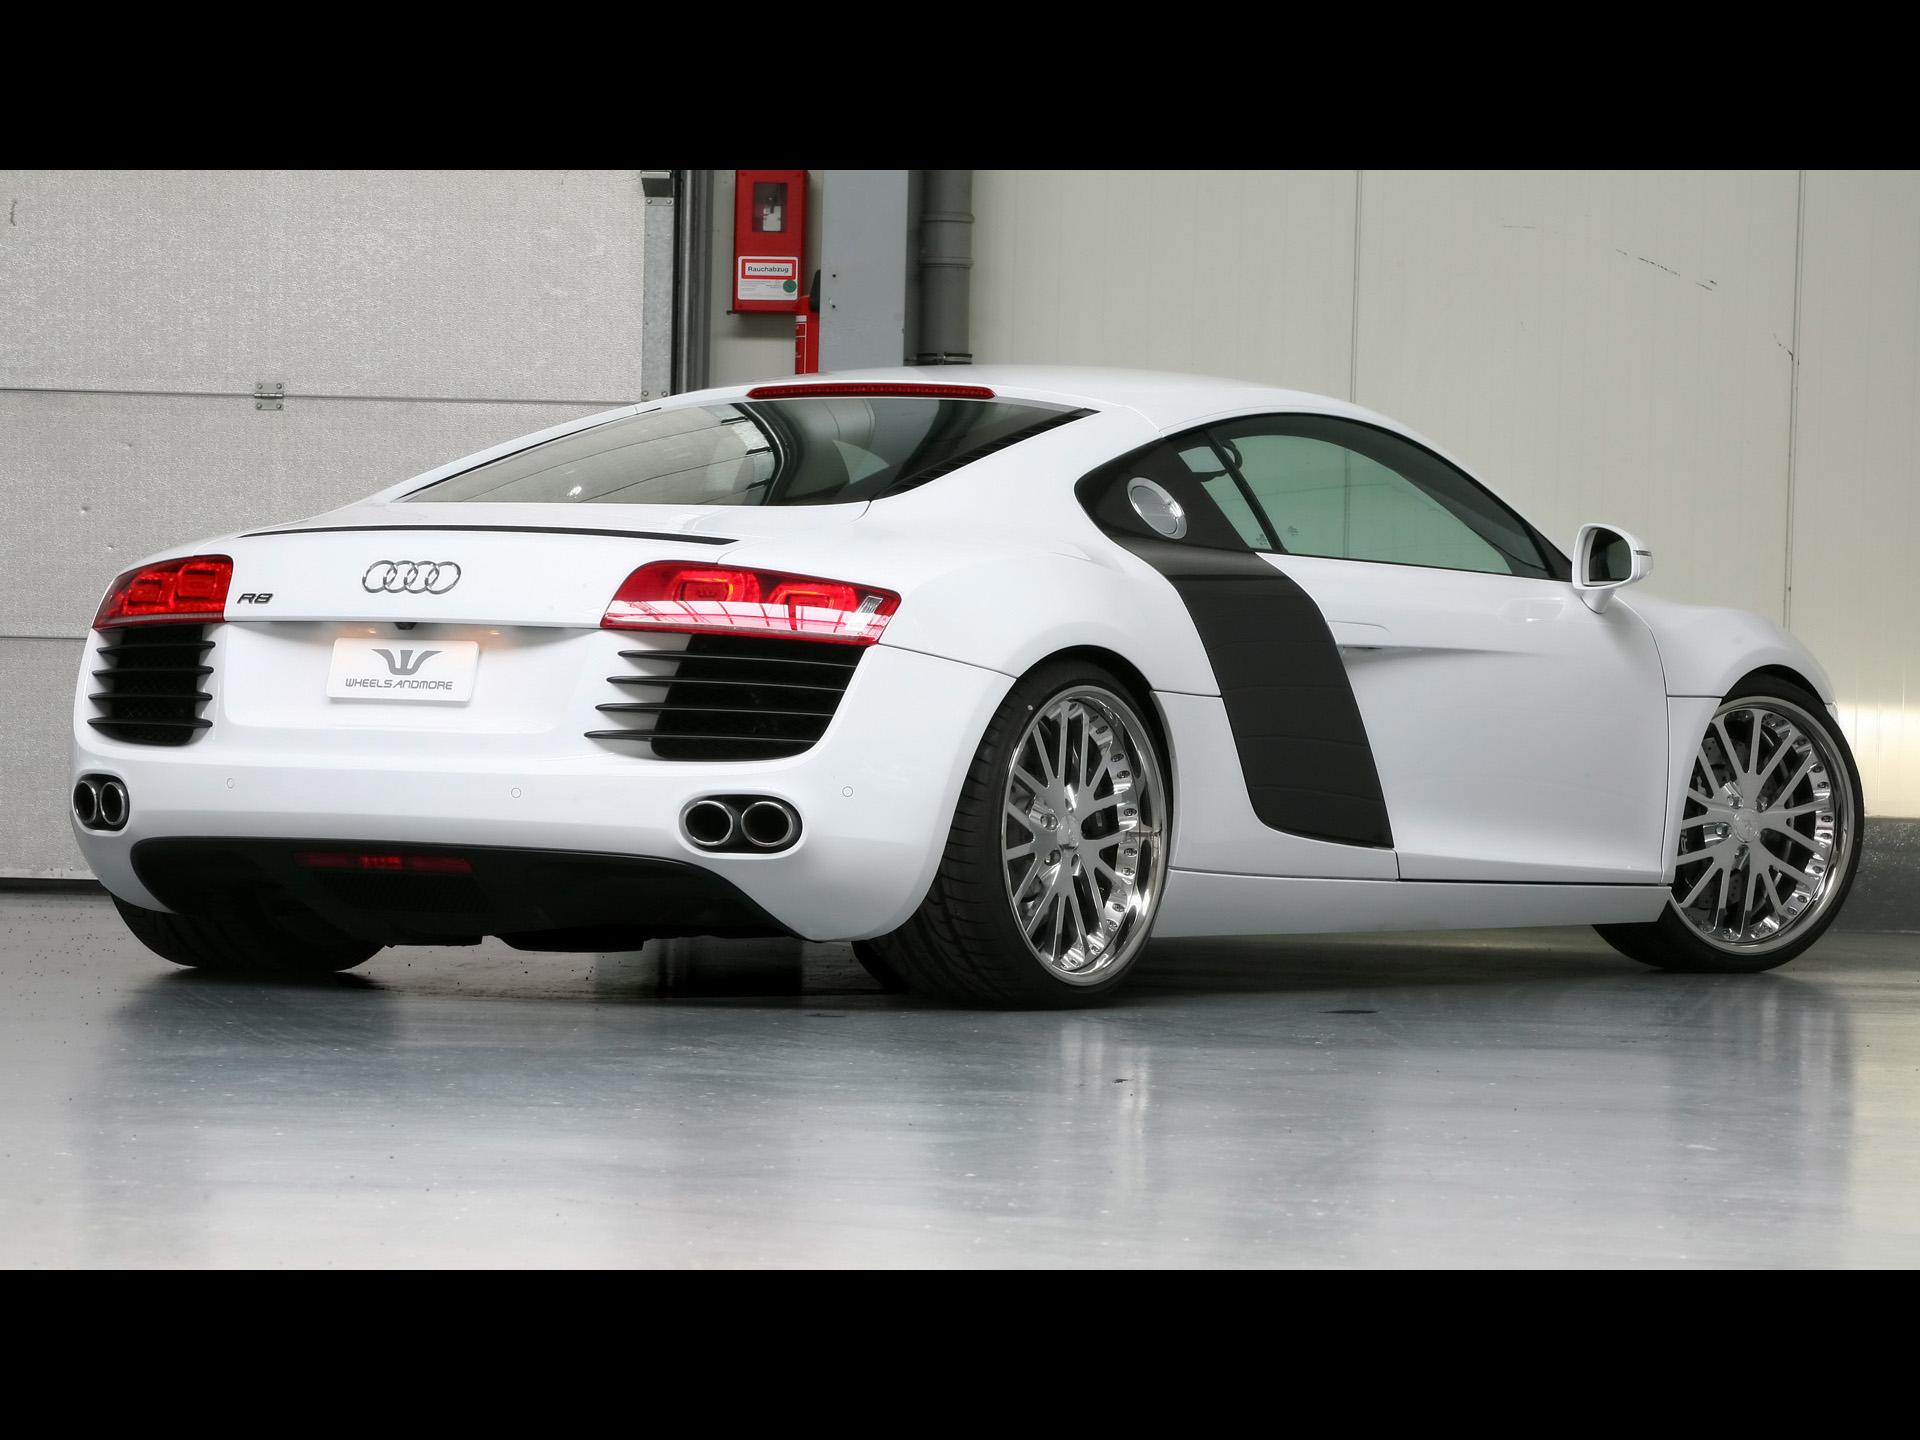 2009 Audi R8 Image 11